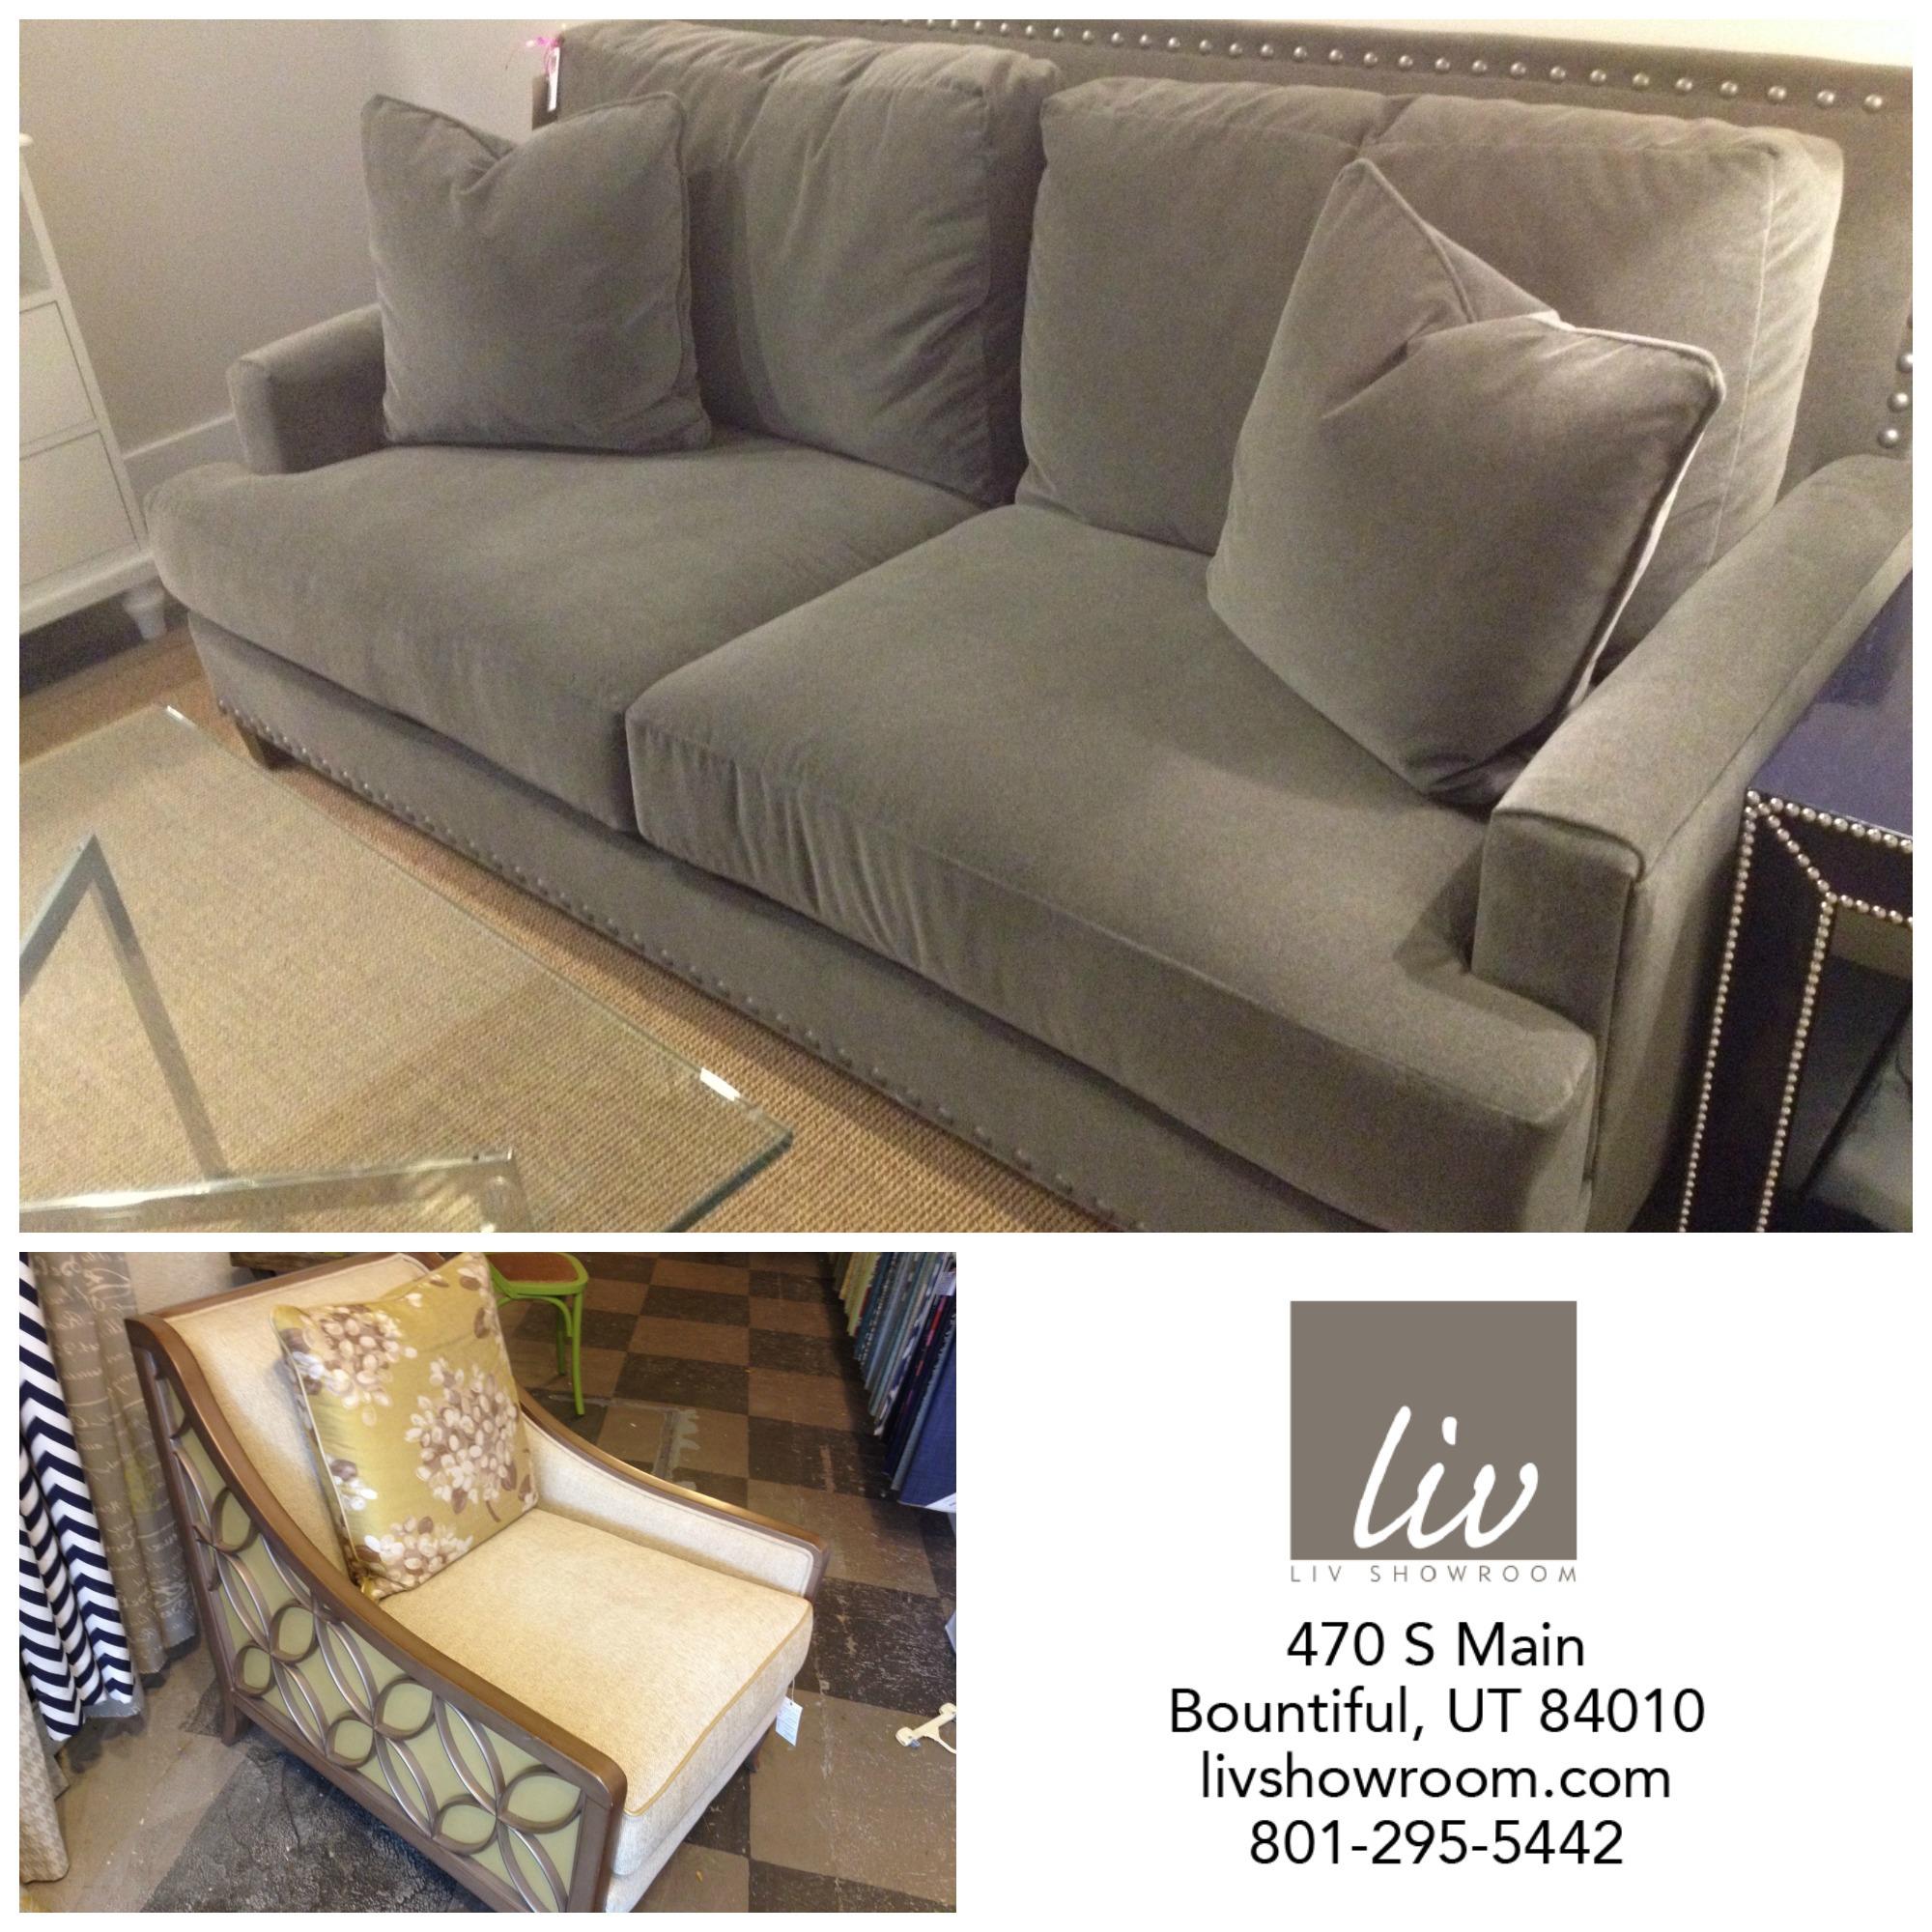 Top: Linkin Sofa // Reg. $2233 //  SALE: $1675   Bottom Left: Social Butterfly Chair // Reg. $1860 //  SALE: $899